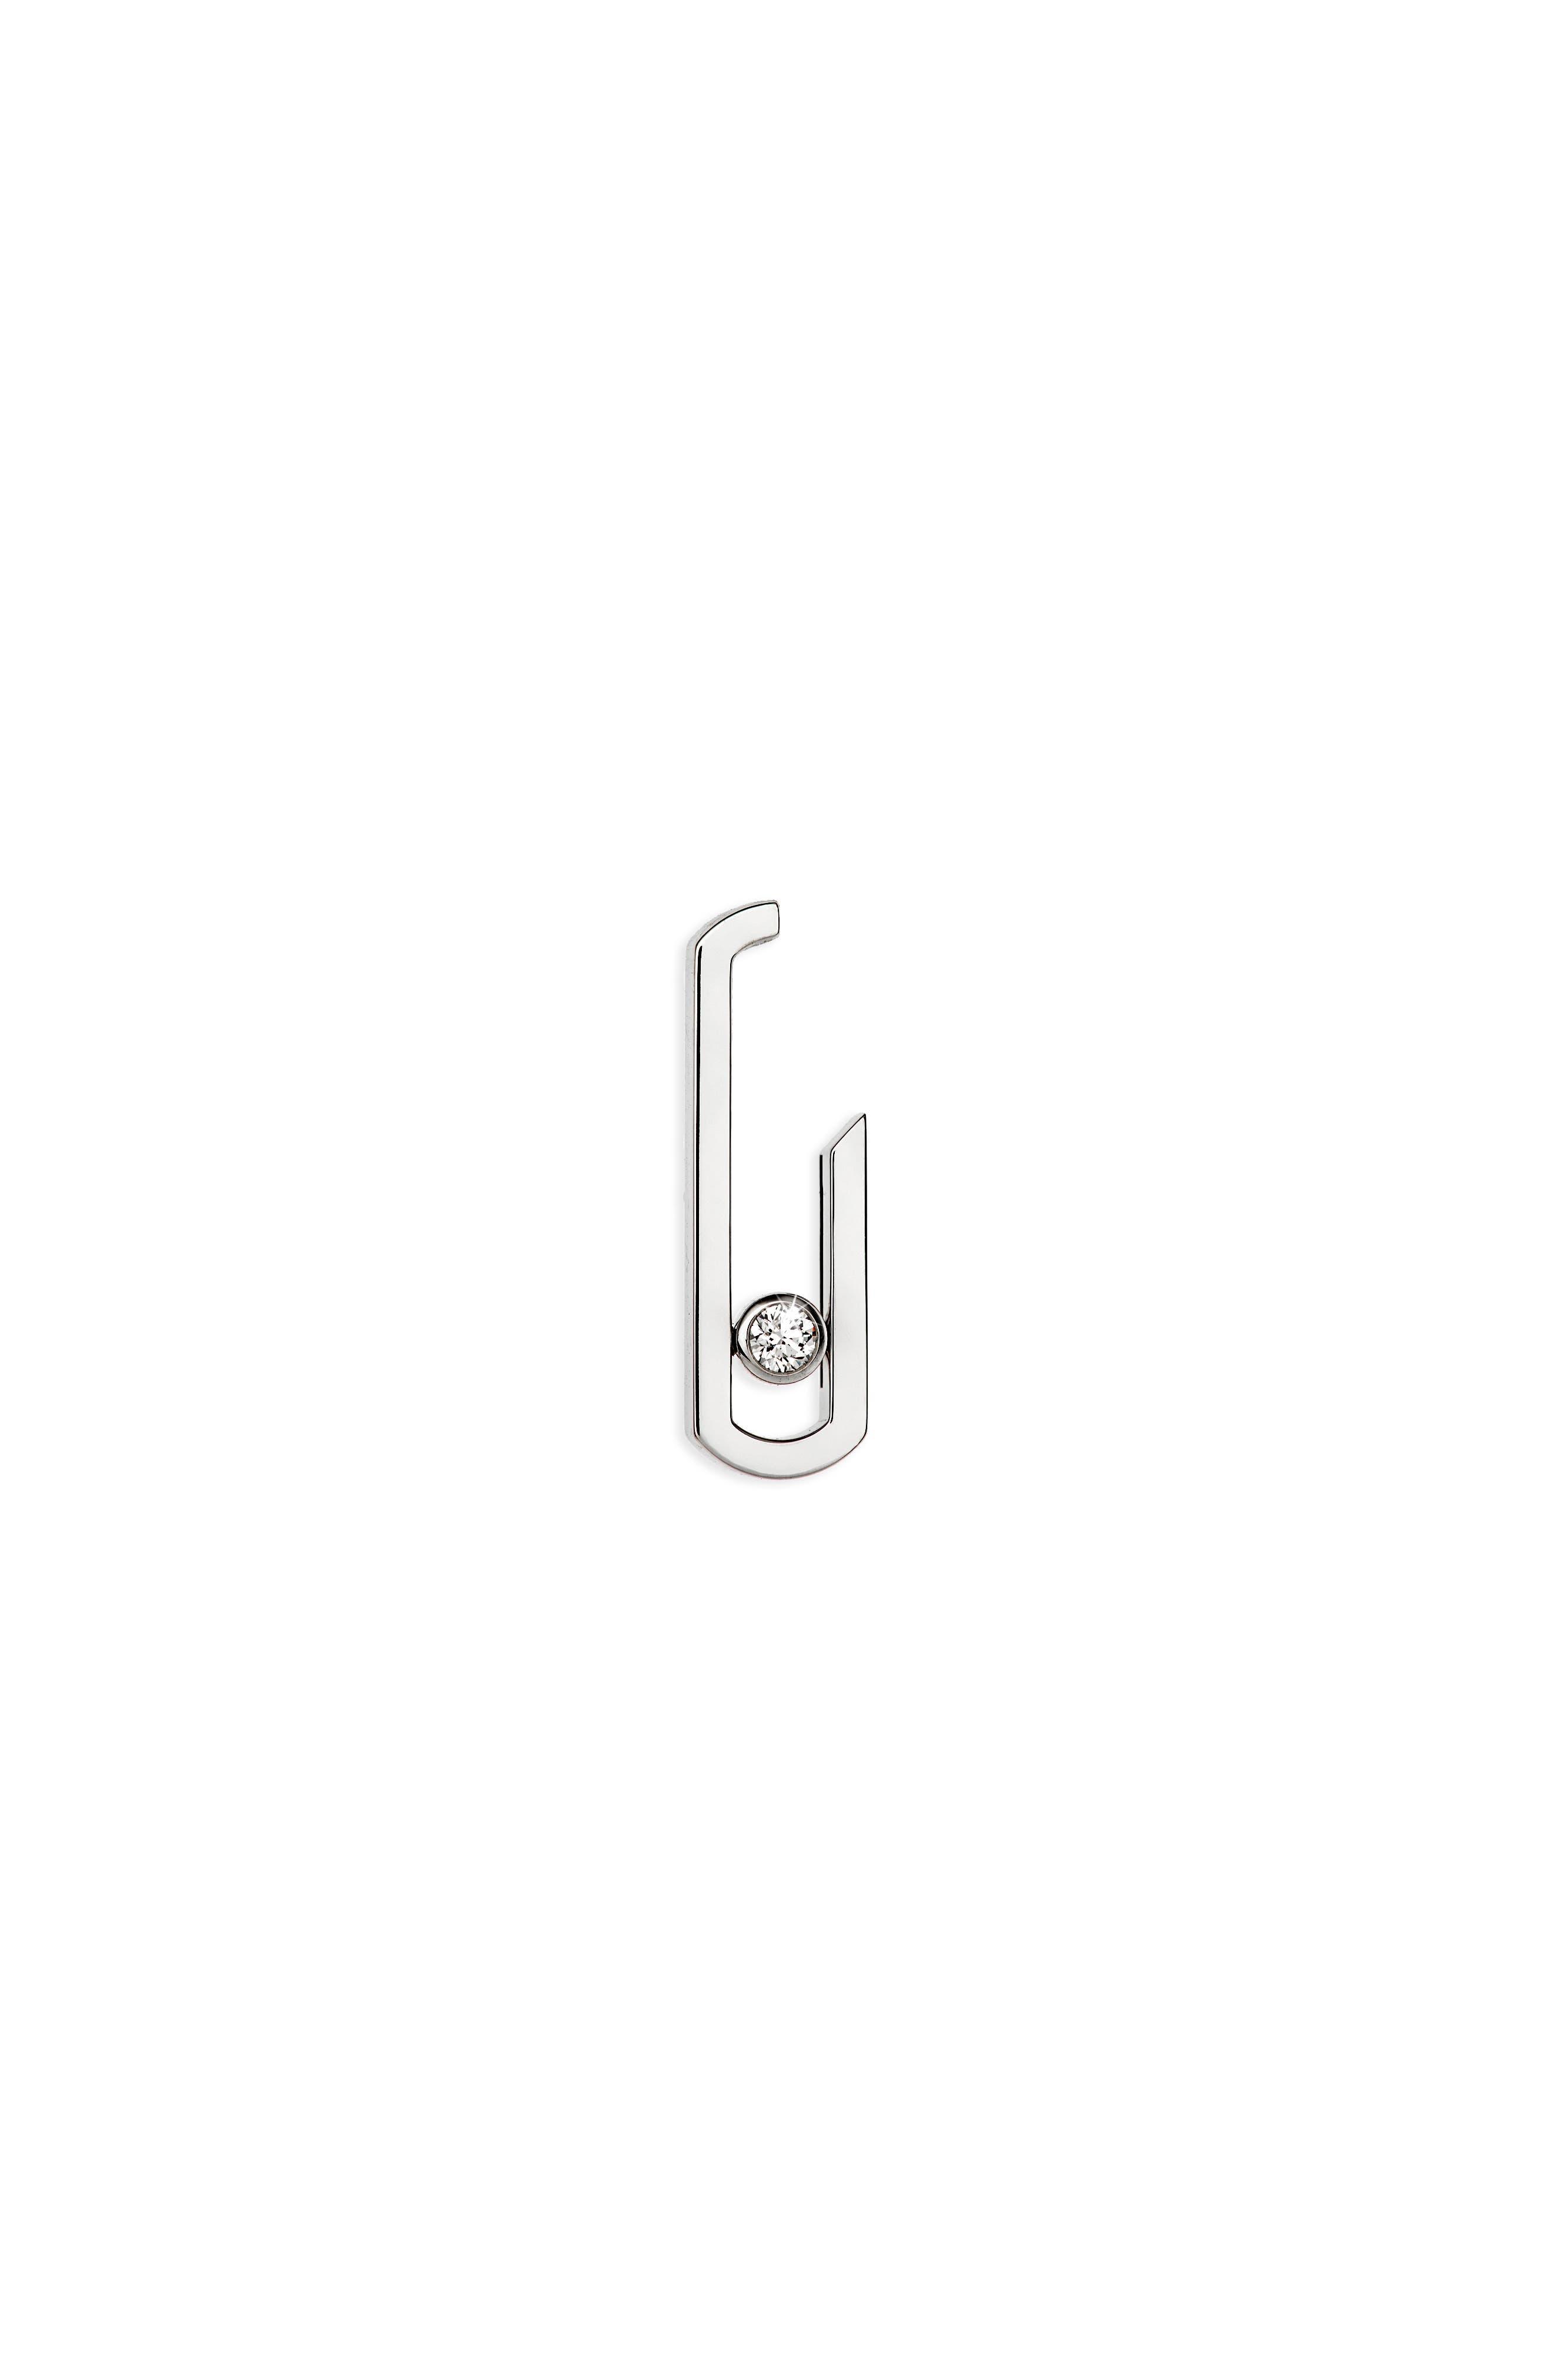 Move Addiction by Gigi Hadid Diamond Earrings,                         Main,                         color, WHITE GOLD